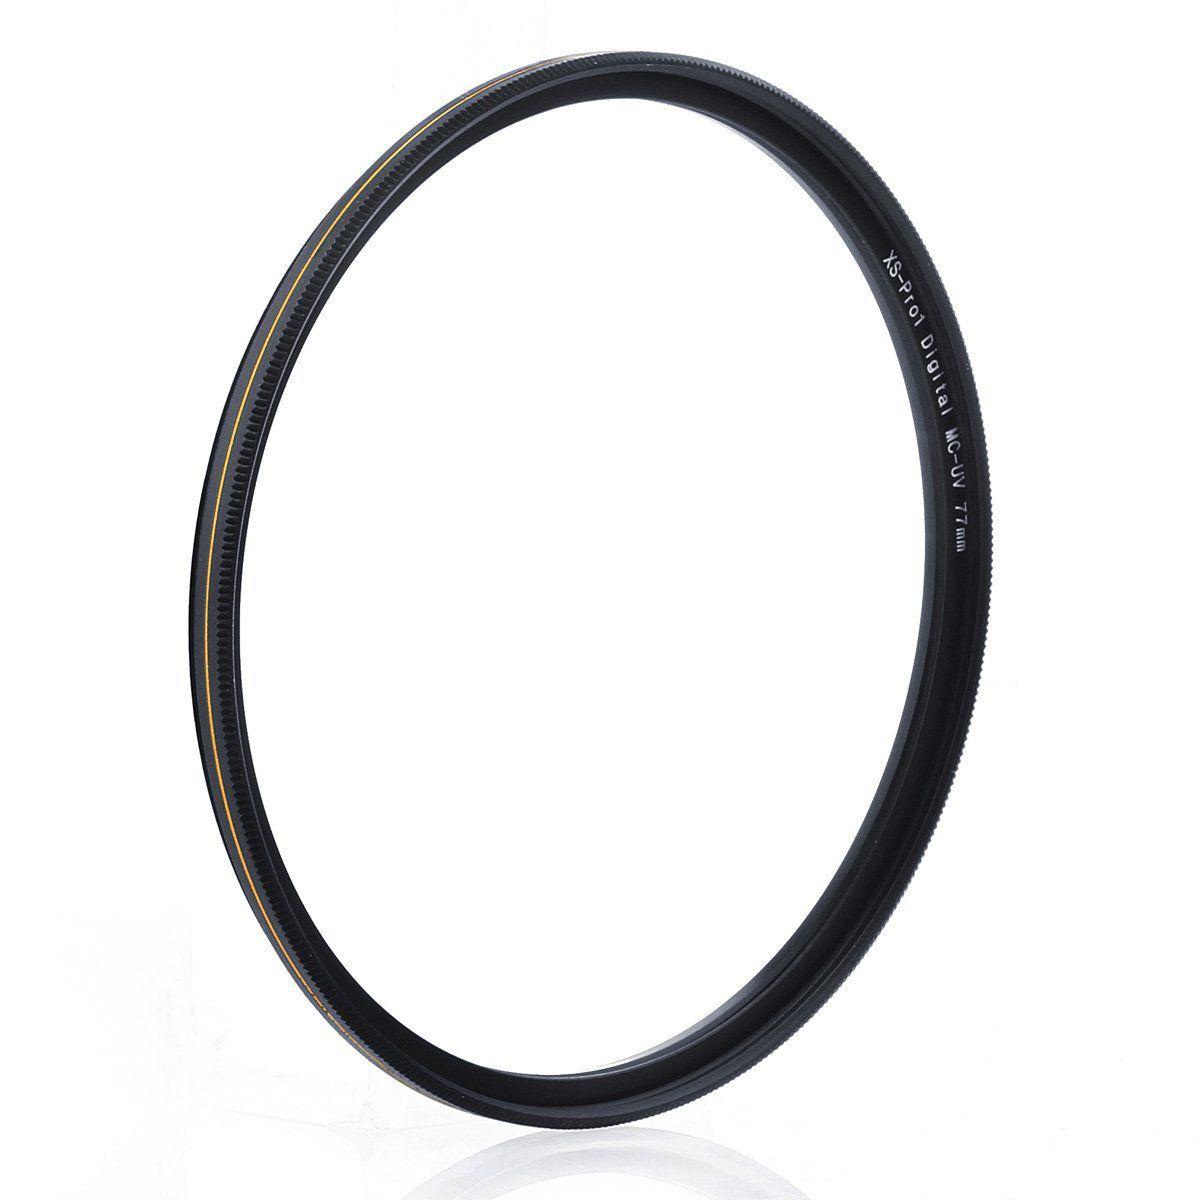 Ultra Slim 16 Layers Multi Coated Ultraviolet Protection Lens Filter for Canon Nikon Sony DSLR Camera Lens waka 55mm MC UV Filter